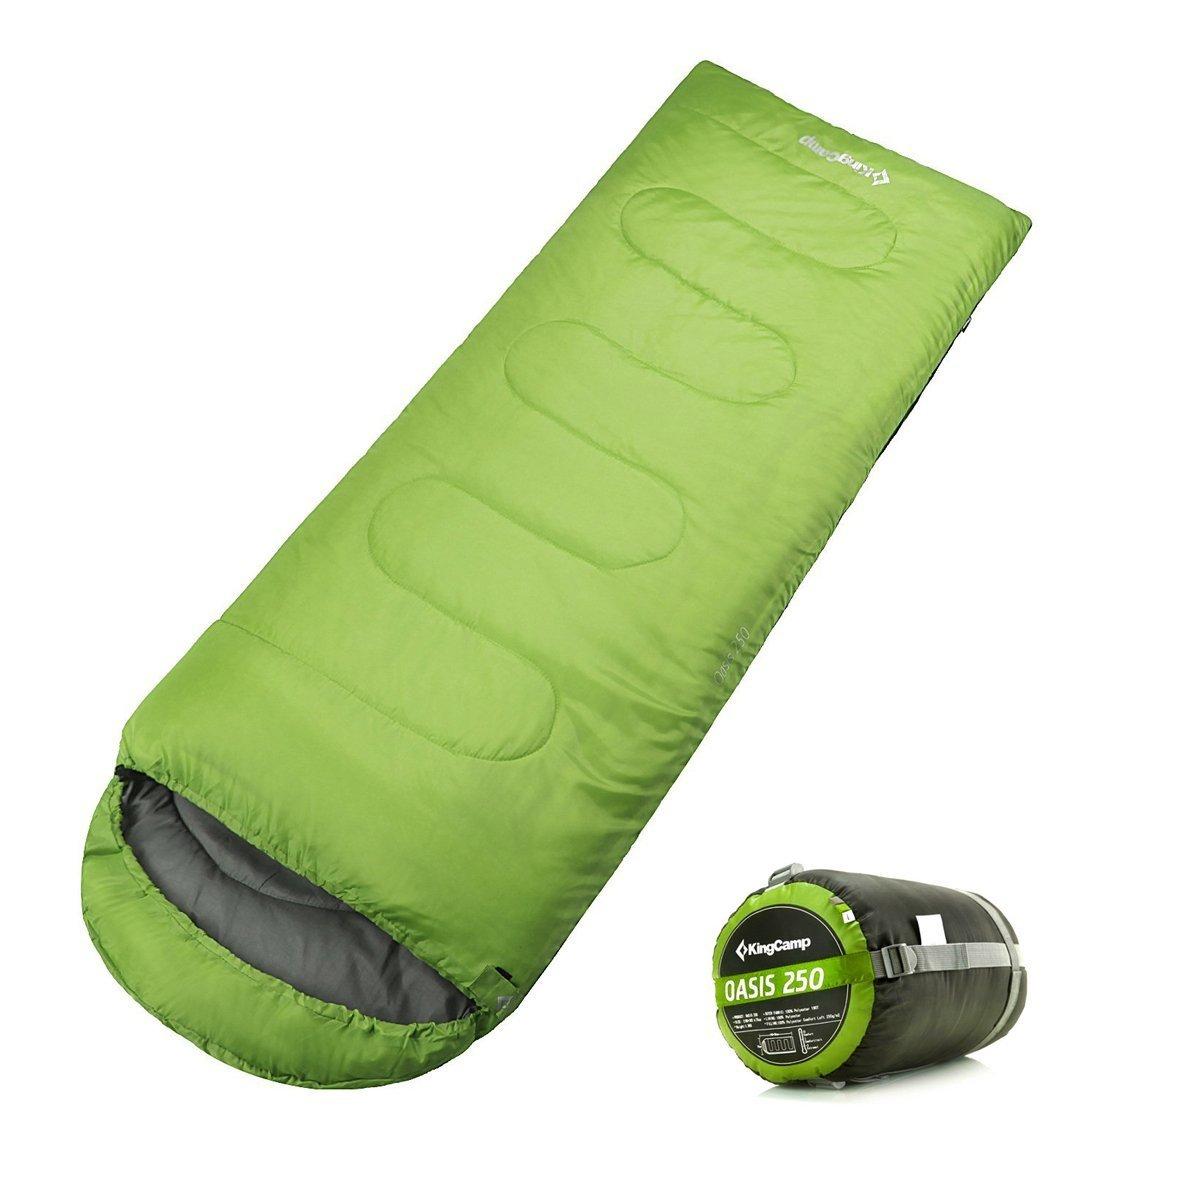 KingCamp SleepingバッグEnvelop 4シーズン快適with Freeフード、圧縮袋ポータブルキャンプ、バックパッキング、屋外の B073QMB8M8  グリーン